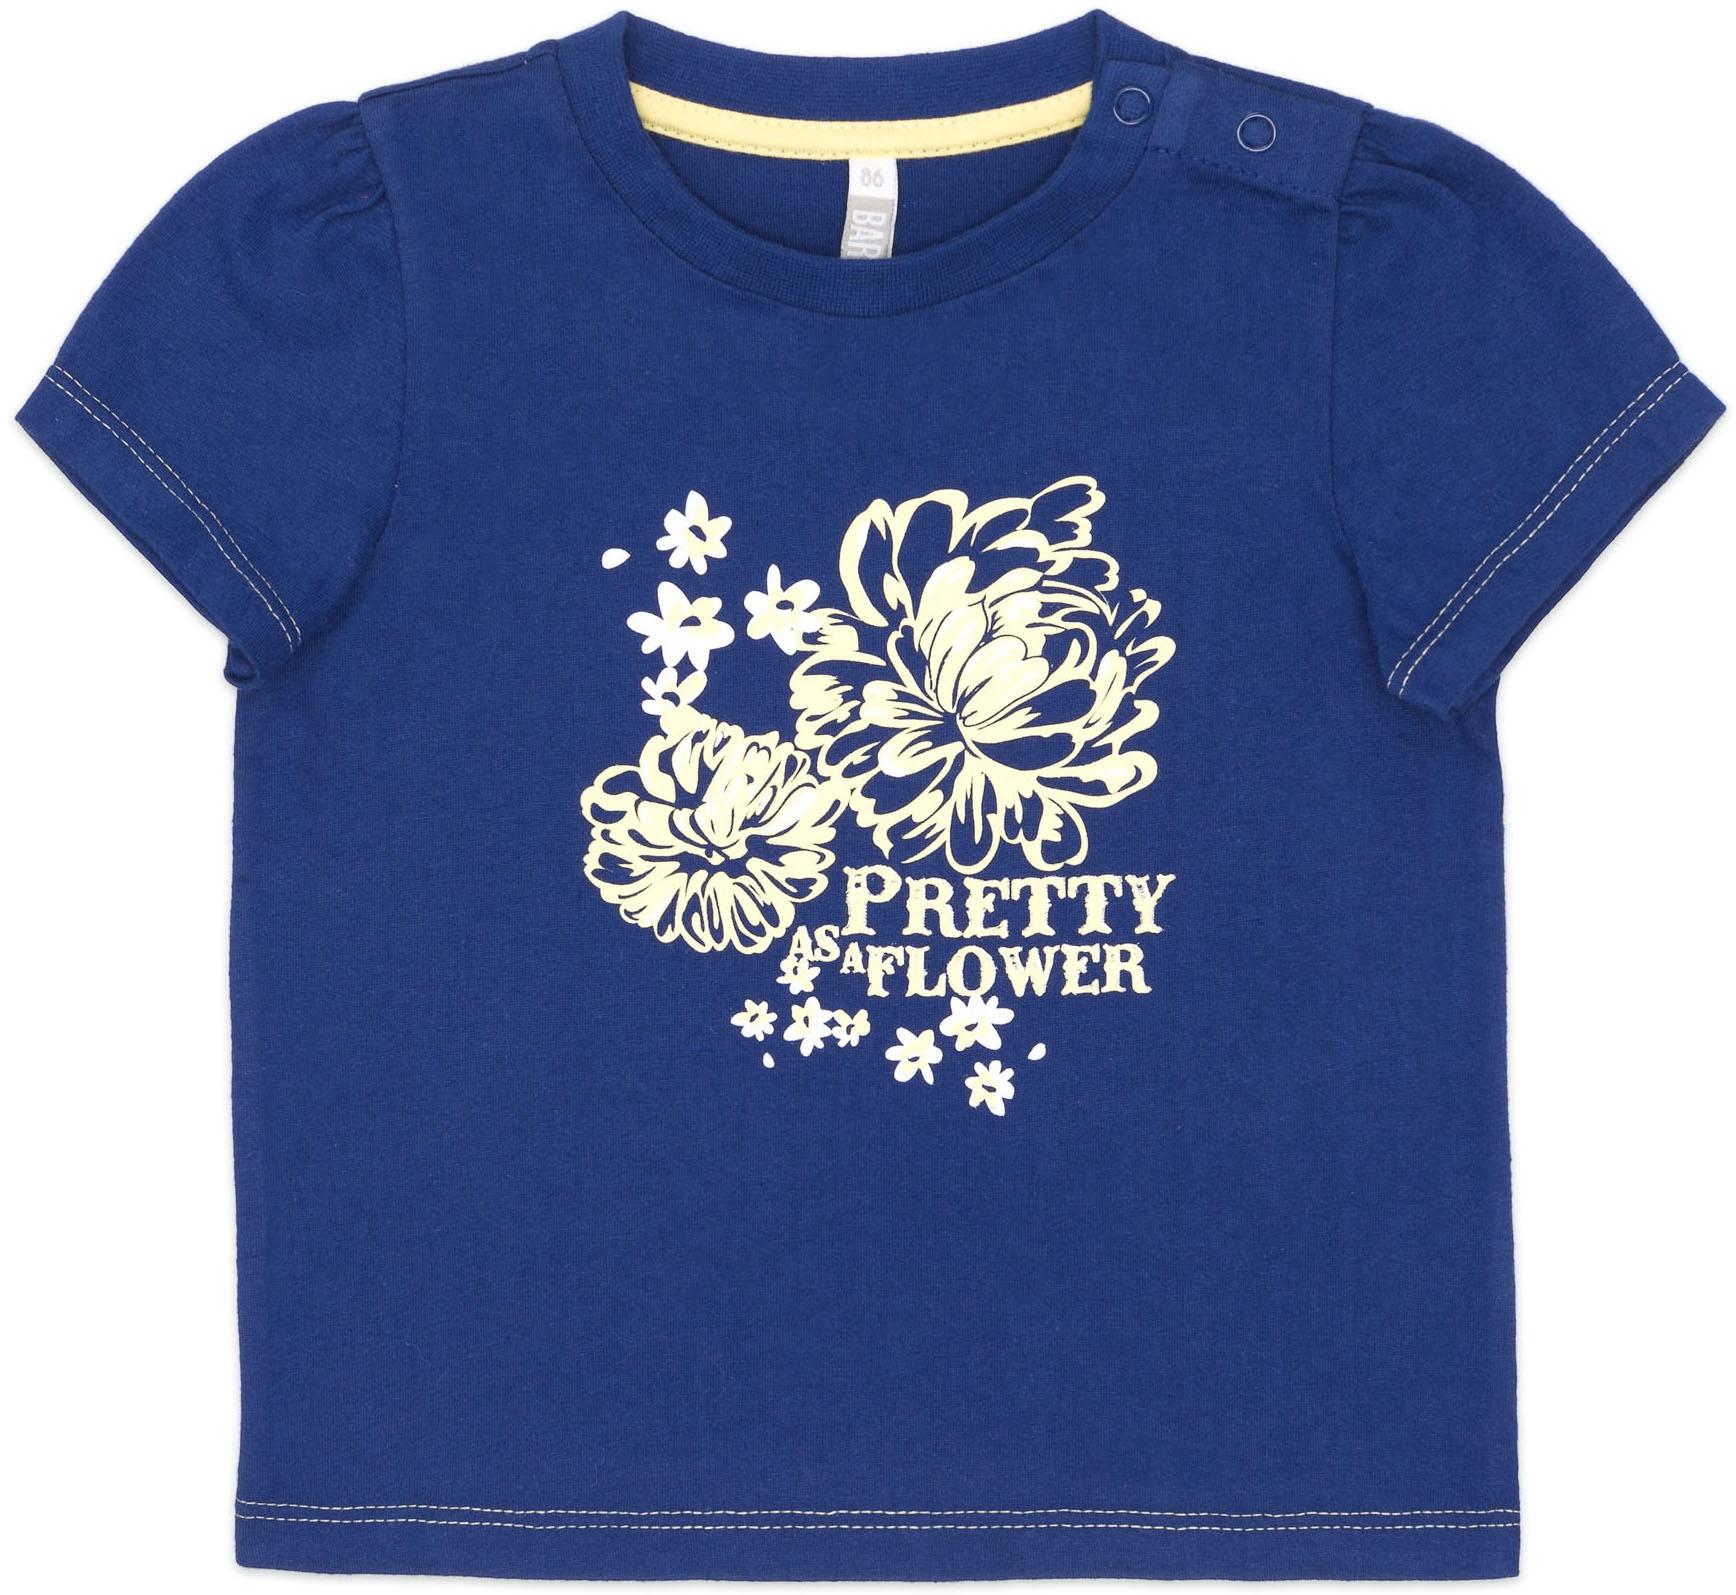 Купить Футболки, Футболка с коротким рукавом для девочки Barkito Цветочное лето синяя, Узбекистан, синий, Женский